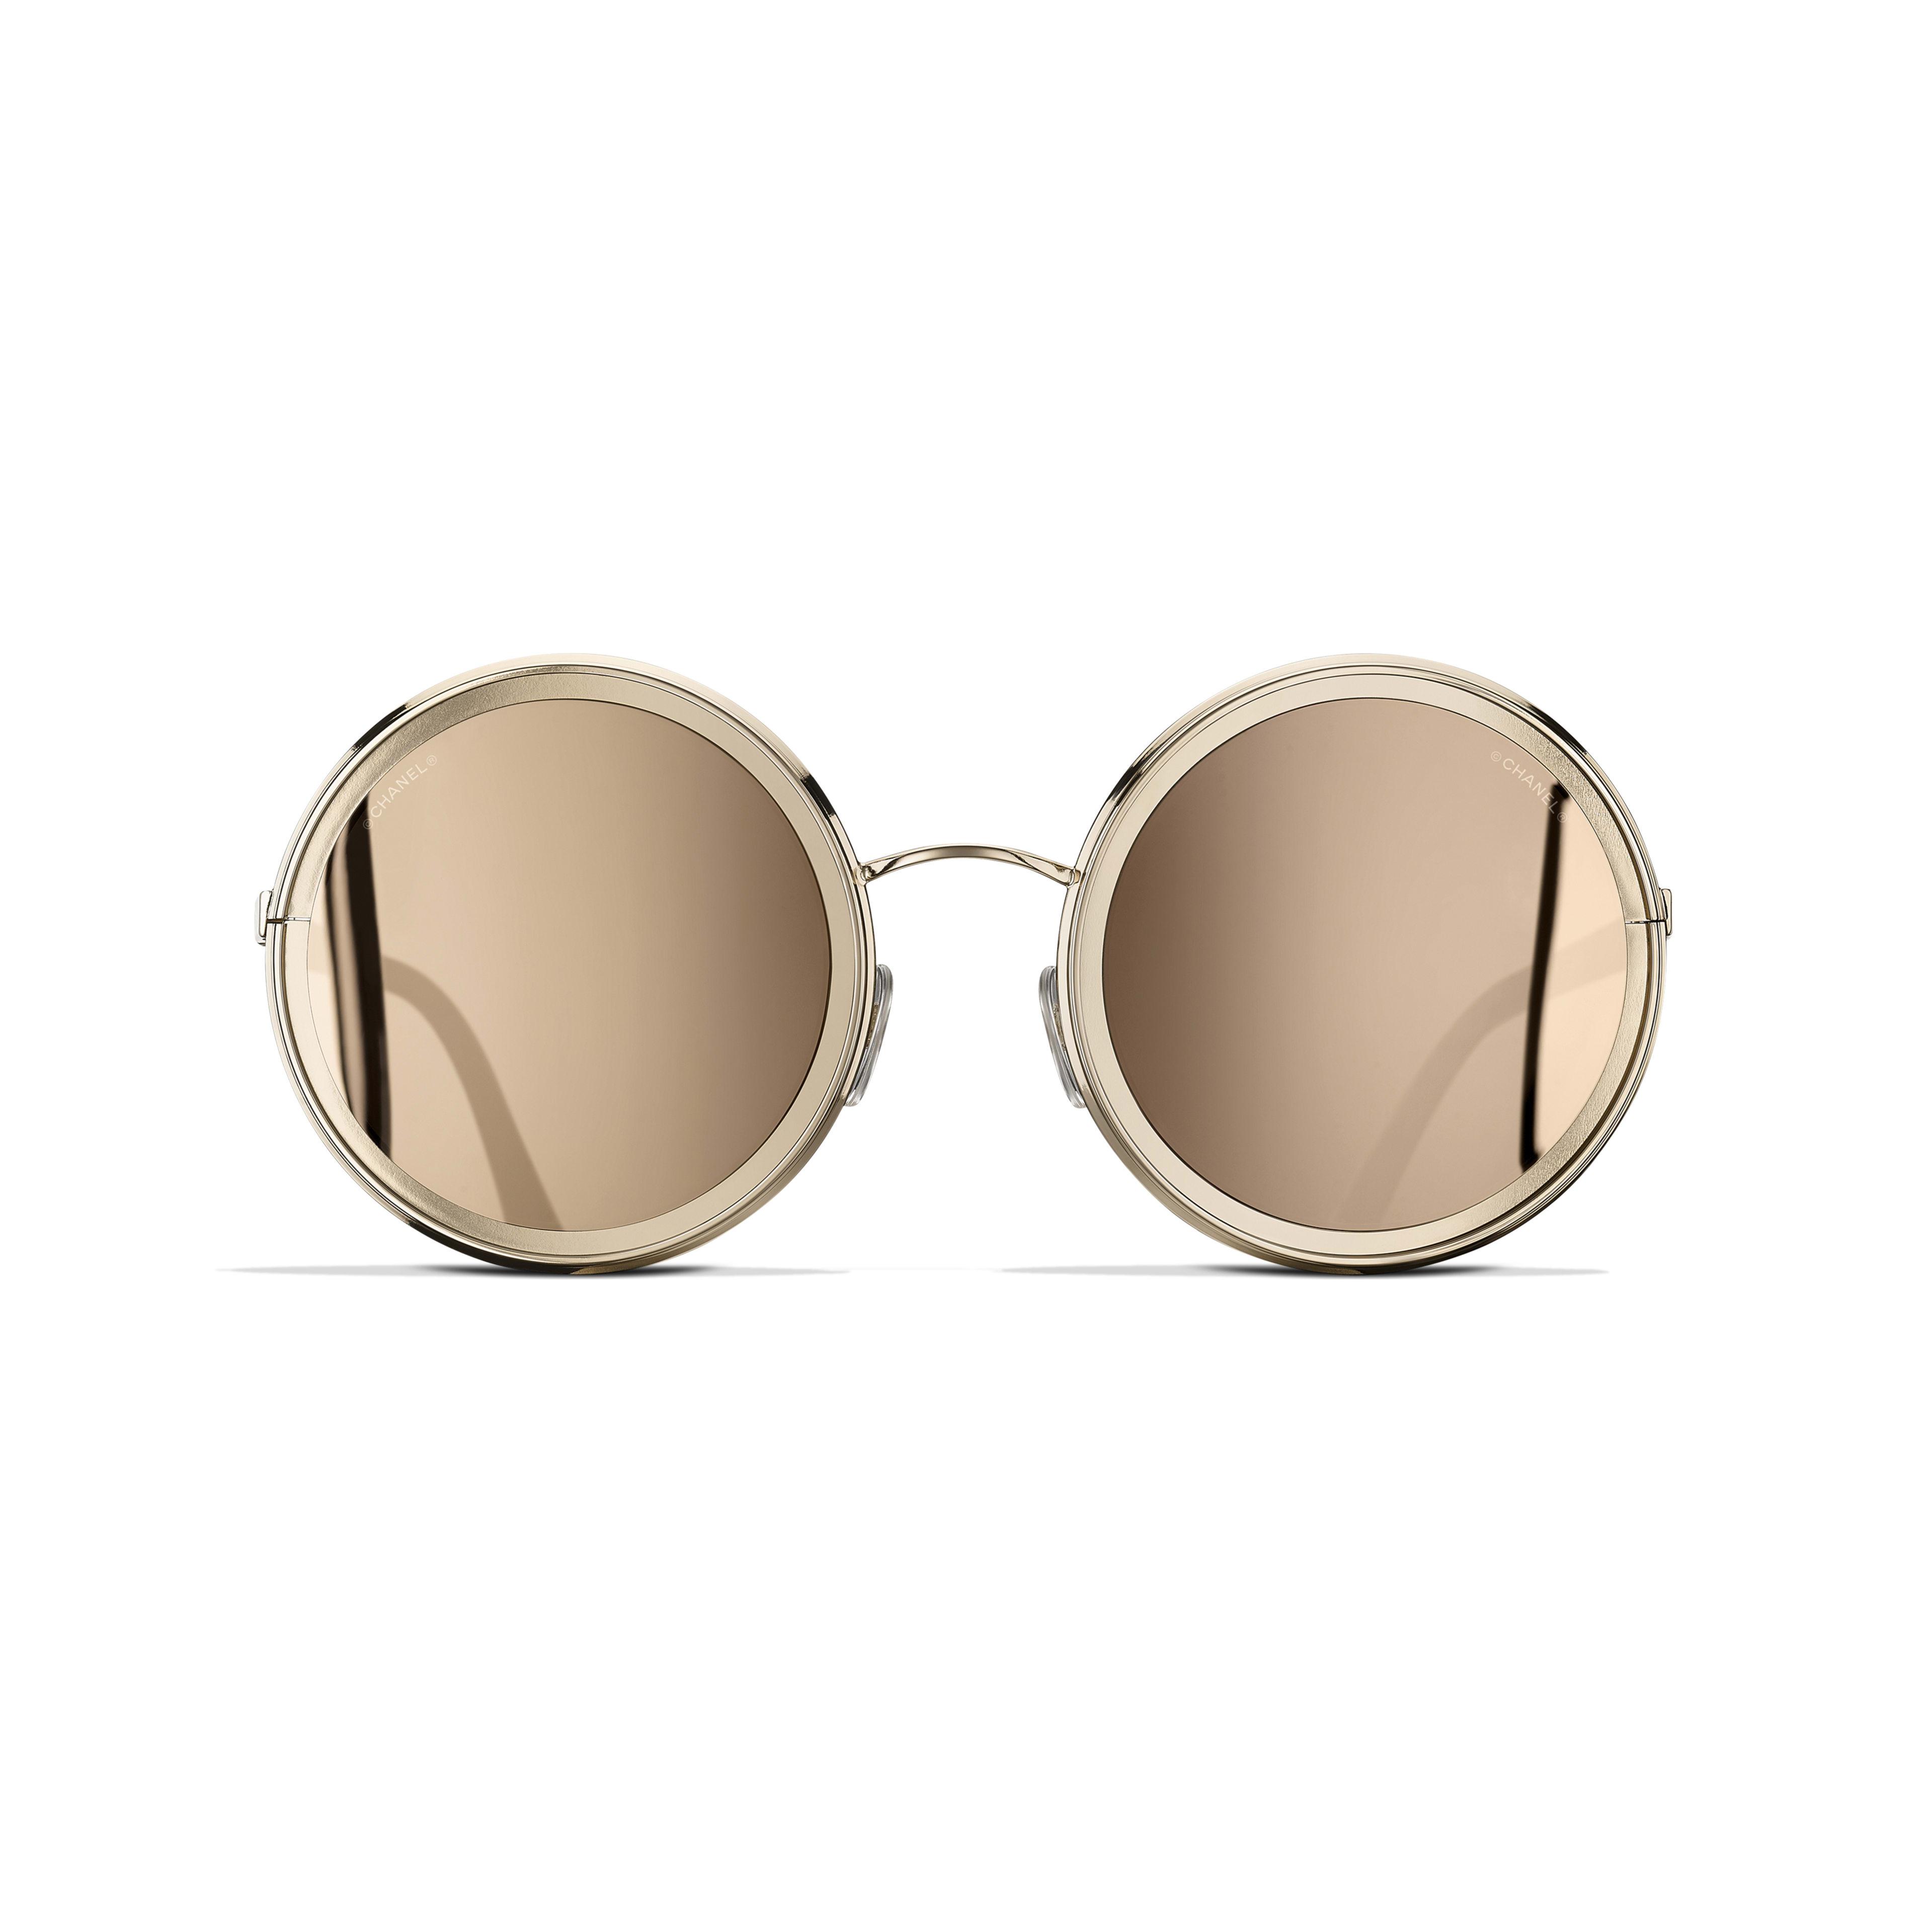 Round Sunglasses - Gold - Metal - 18-Karat Gold Lenses - Alternative view - see full sized version